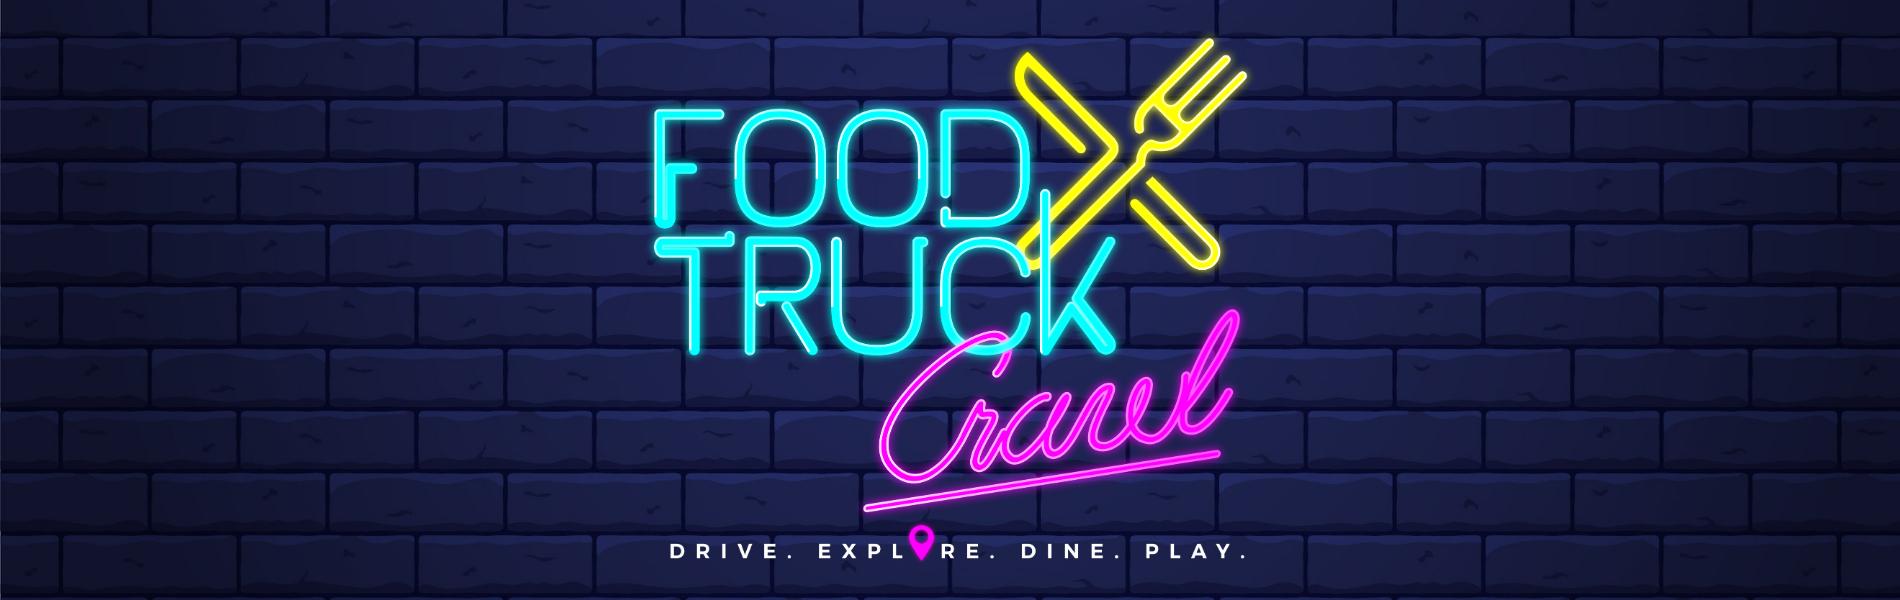 Food Truck Thursdays in Downtown Valdosta